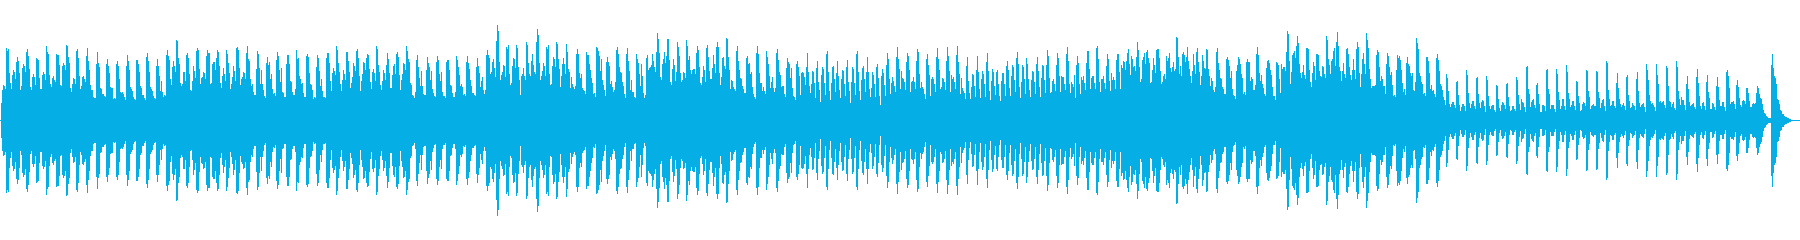 KANT柔らかい商品紹介日常623の再生済みの波形